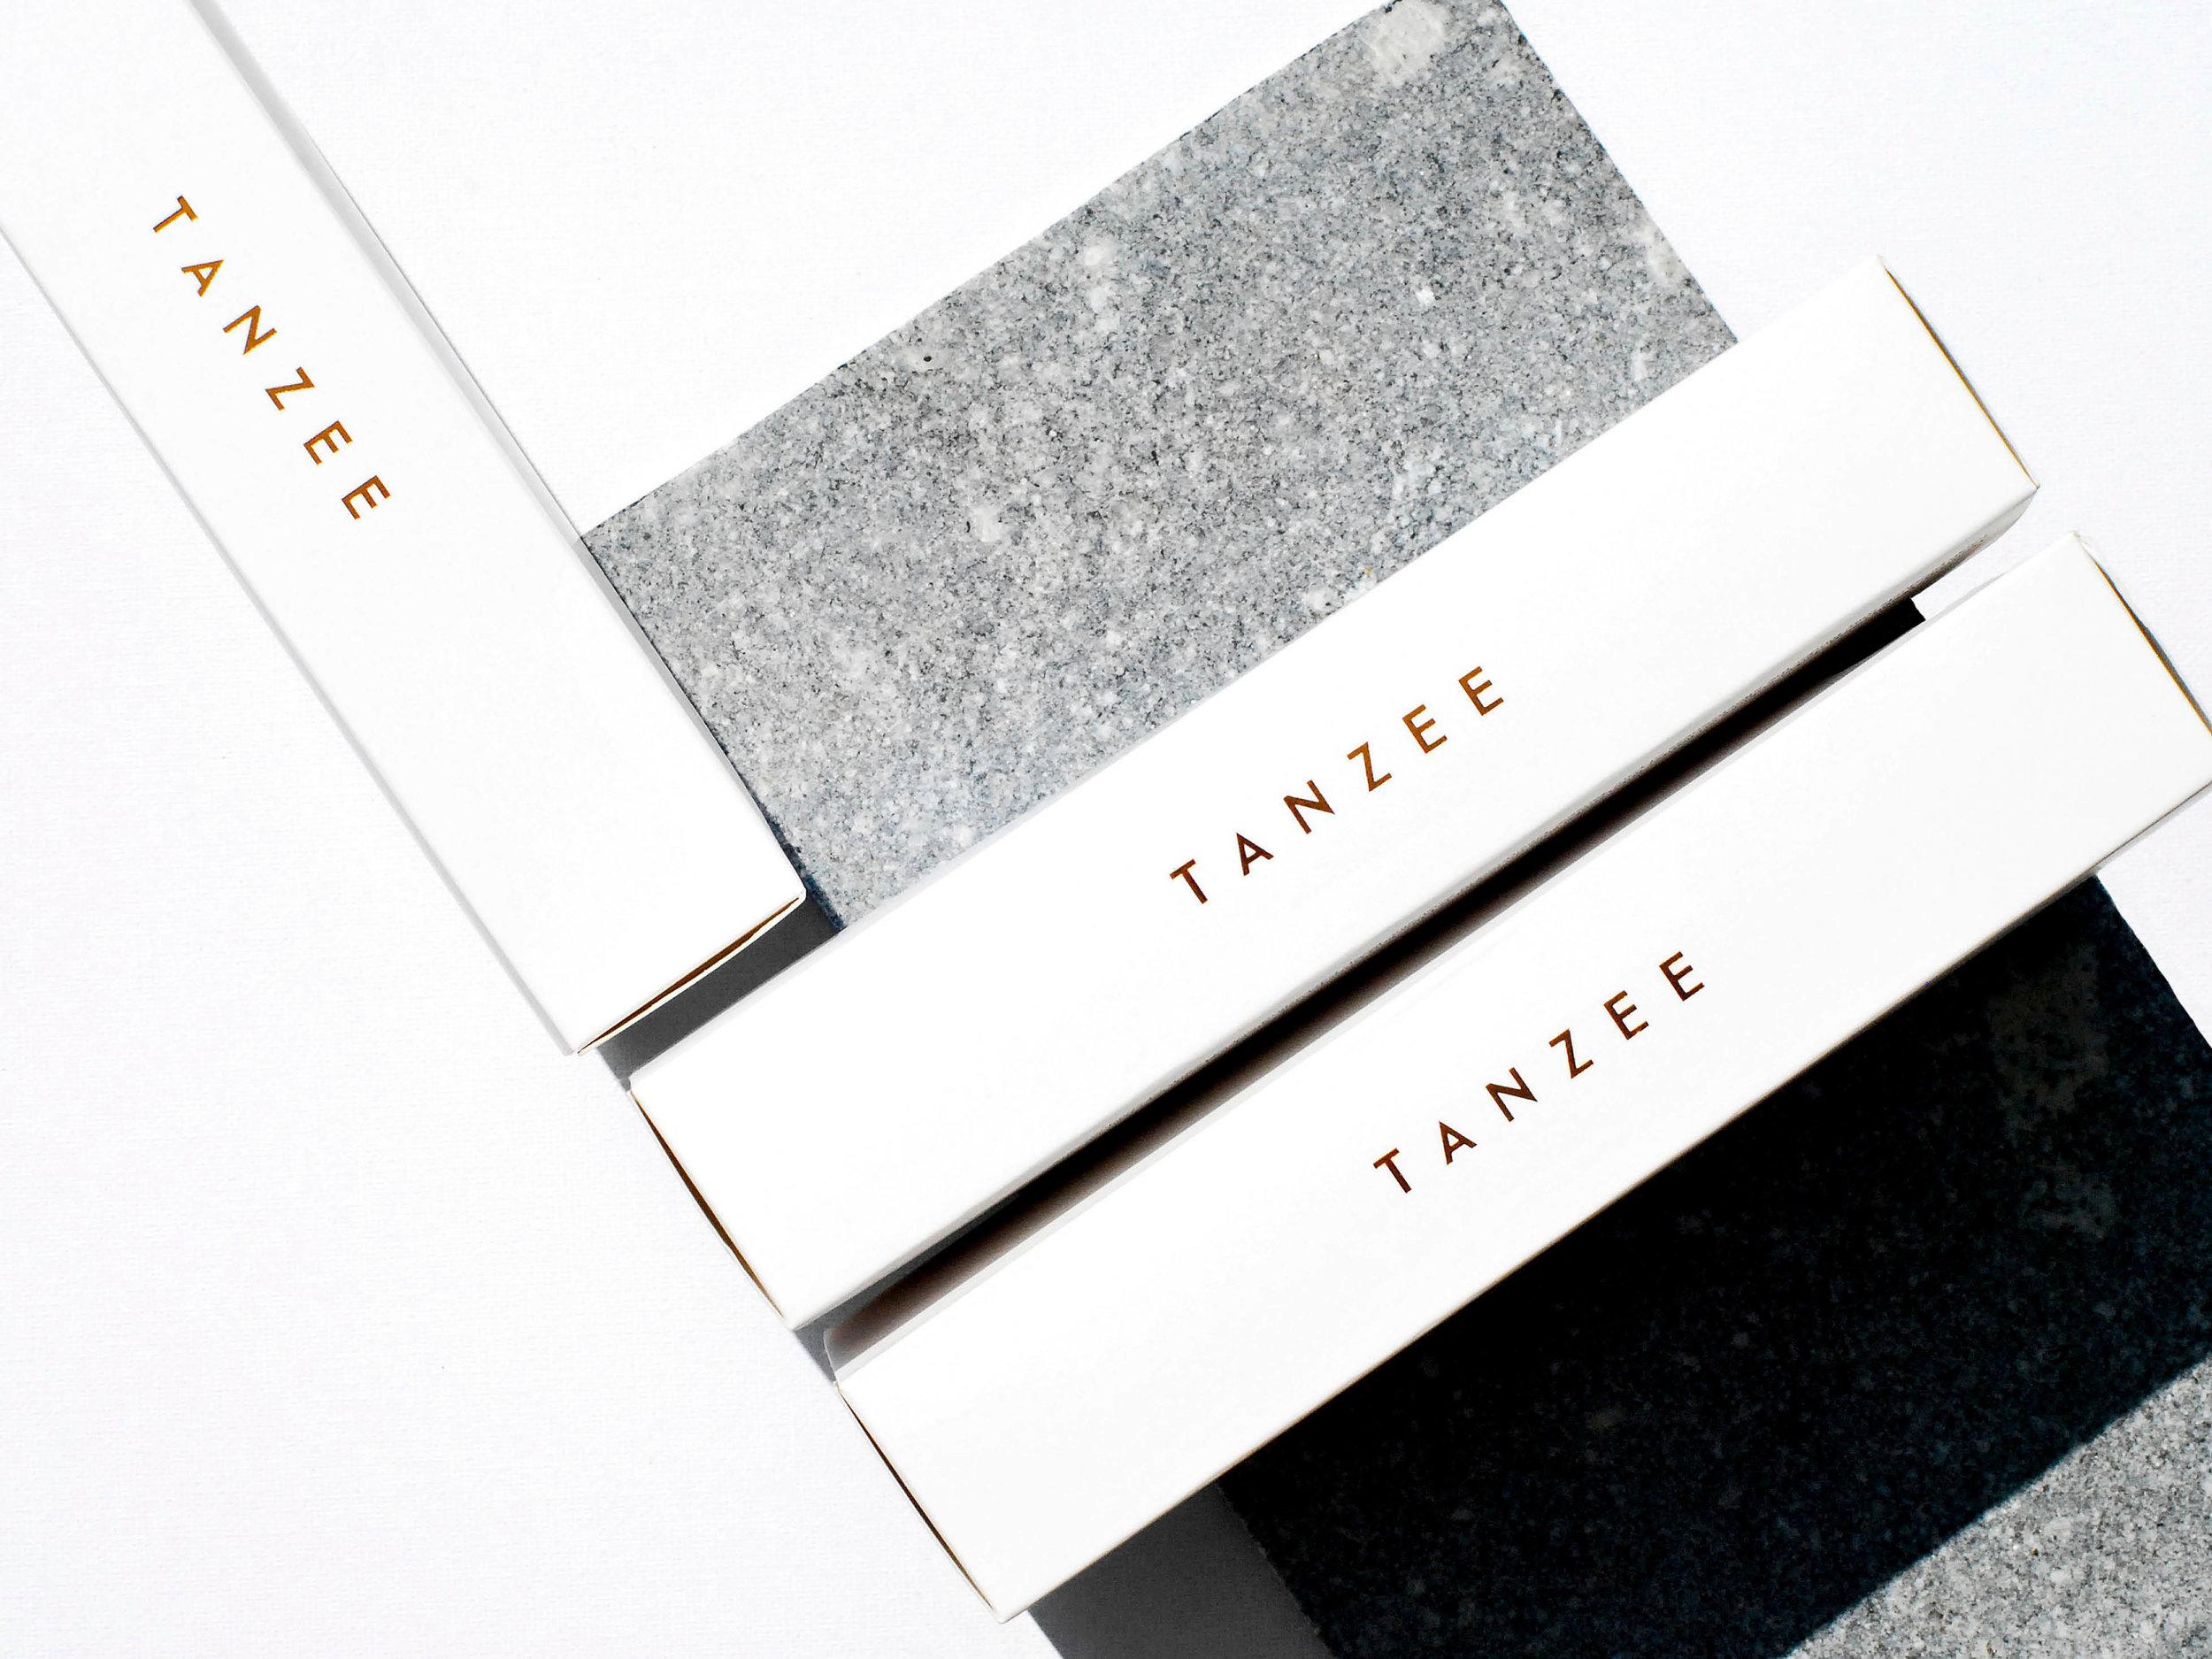 Tanzee_Body_Packaging_Branding_Design_4